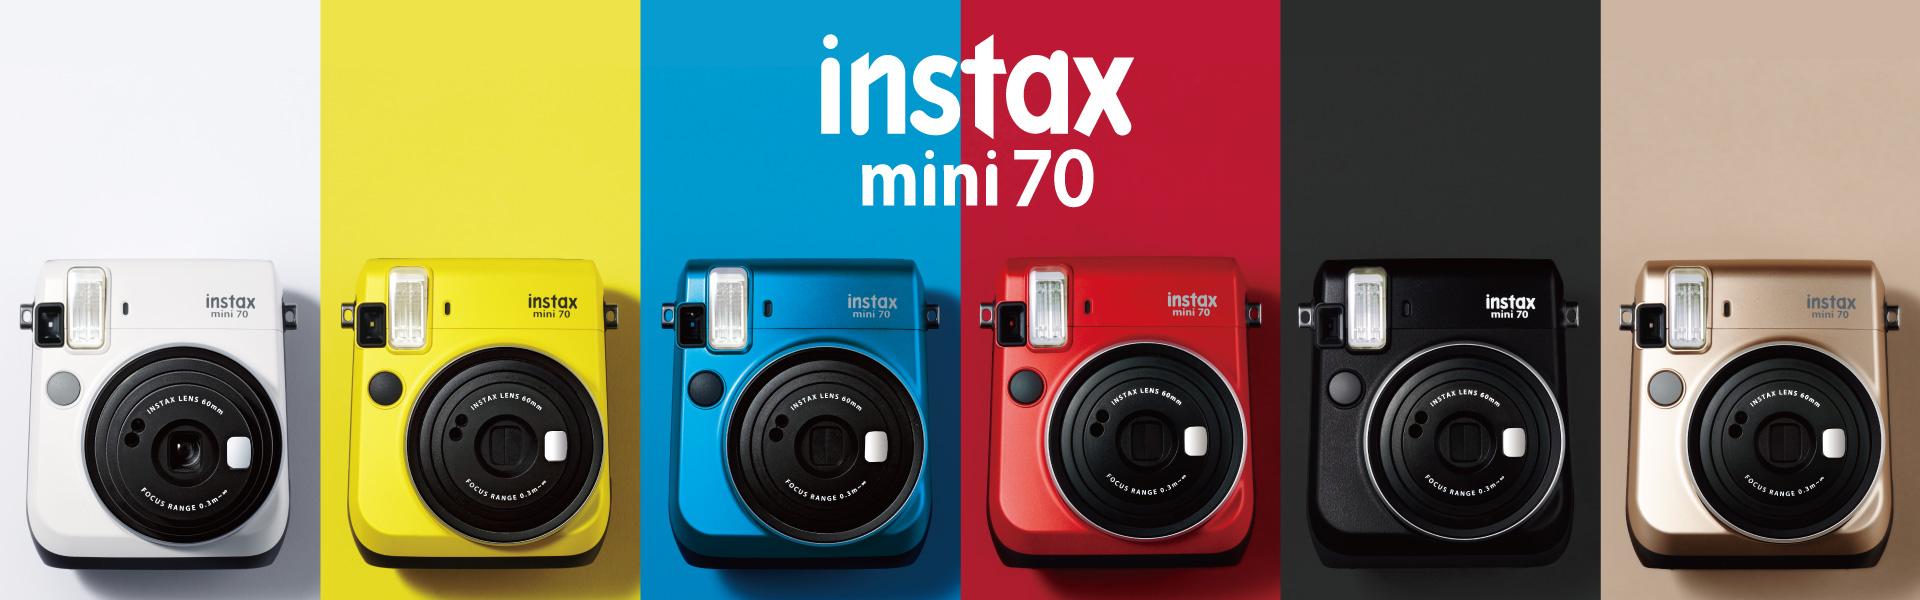 [image] instax mini 70